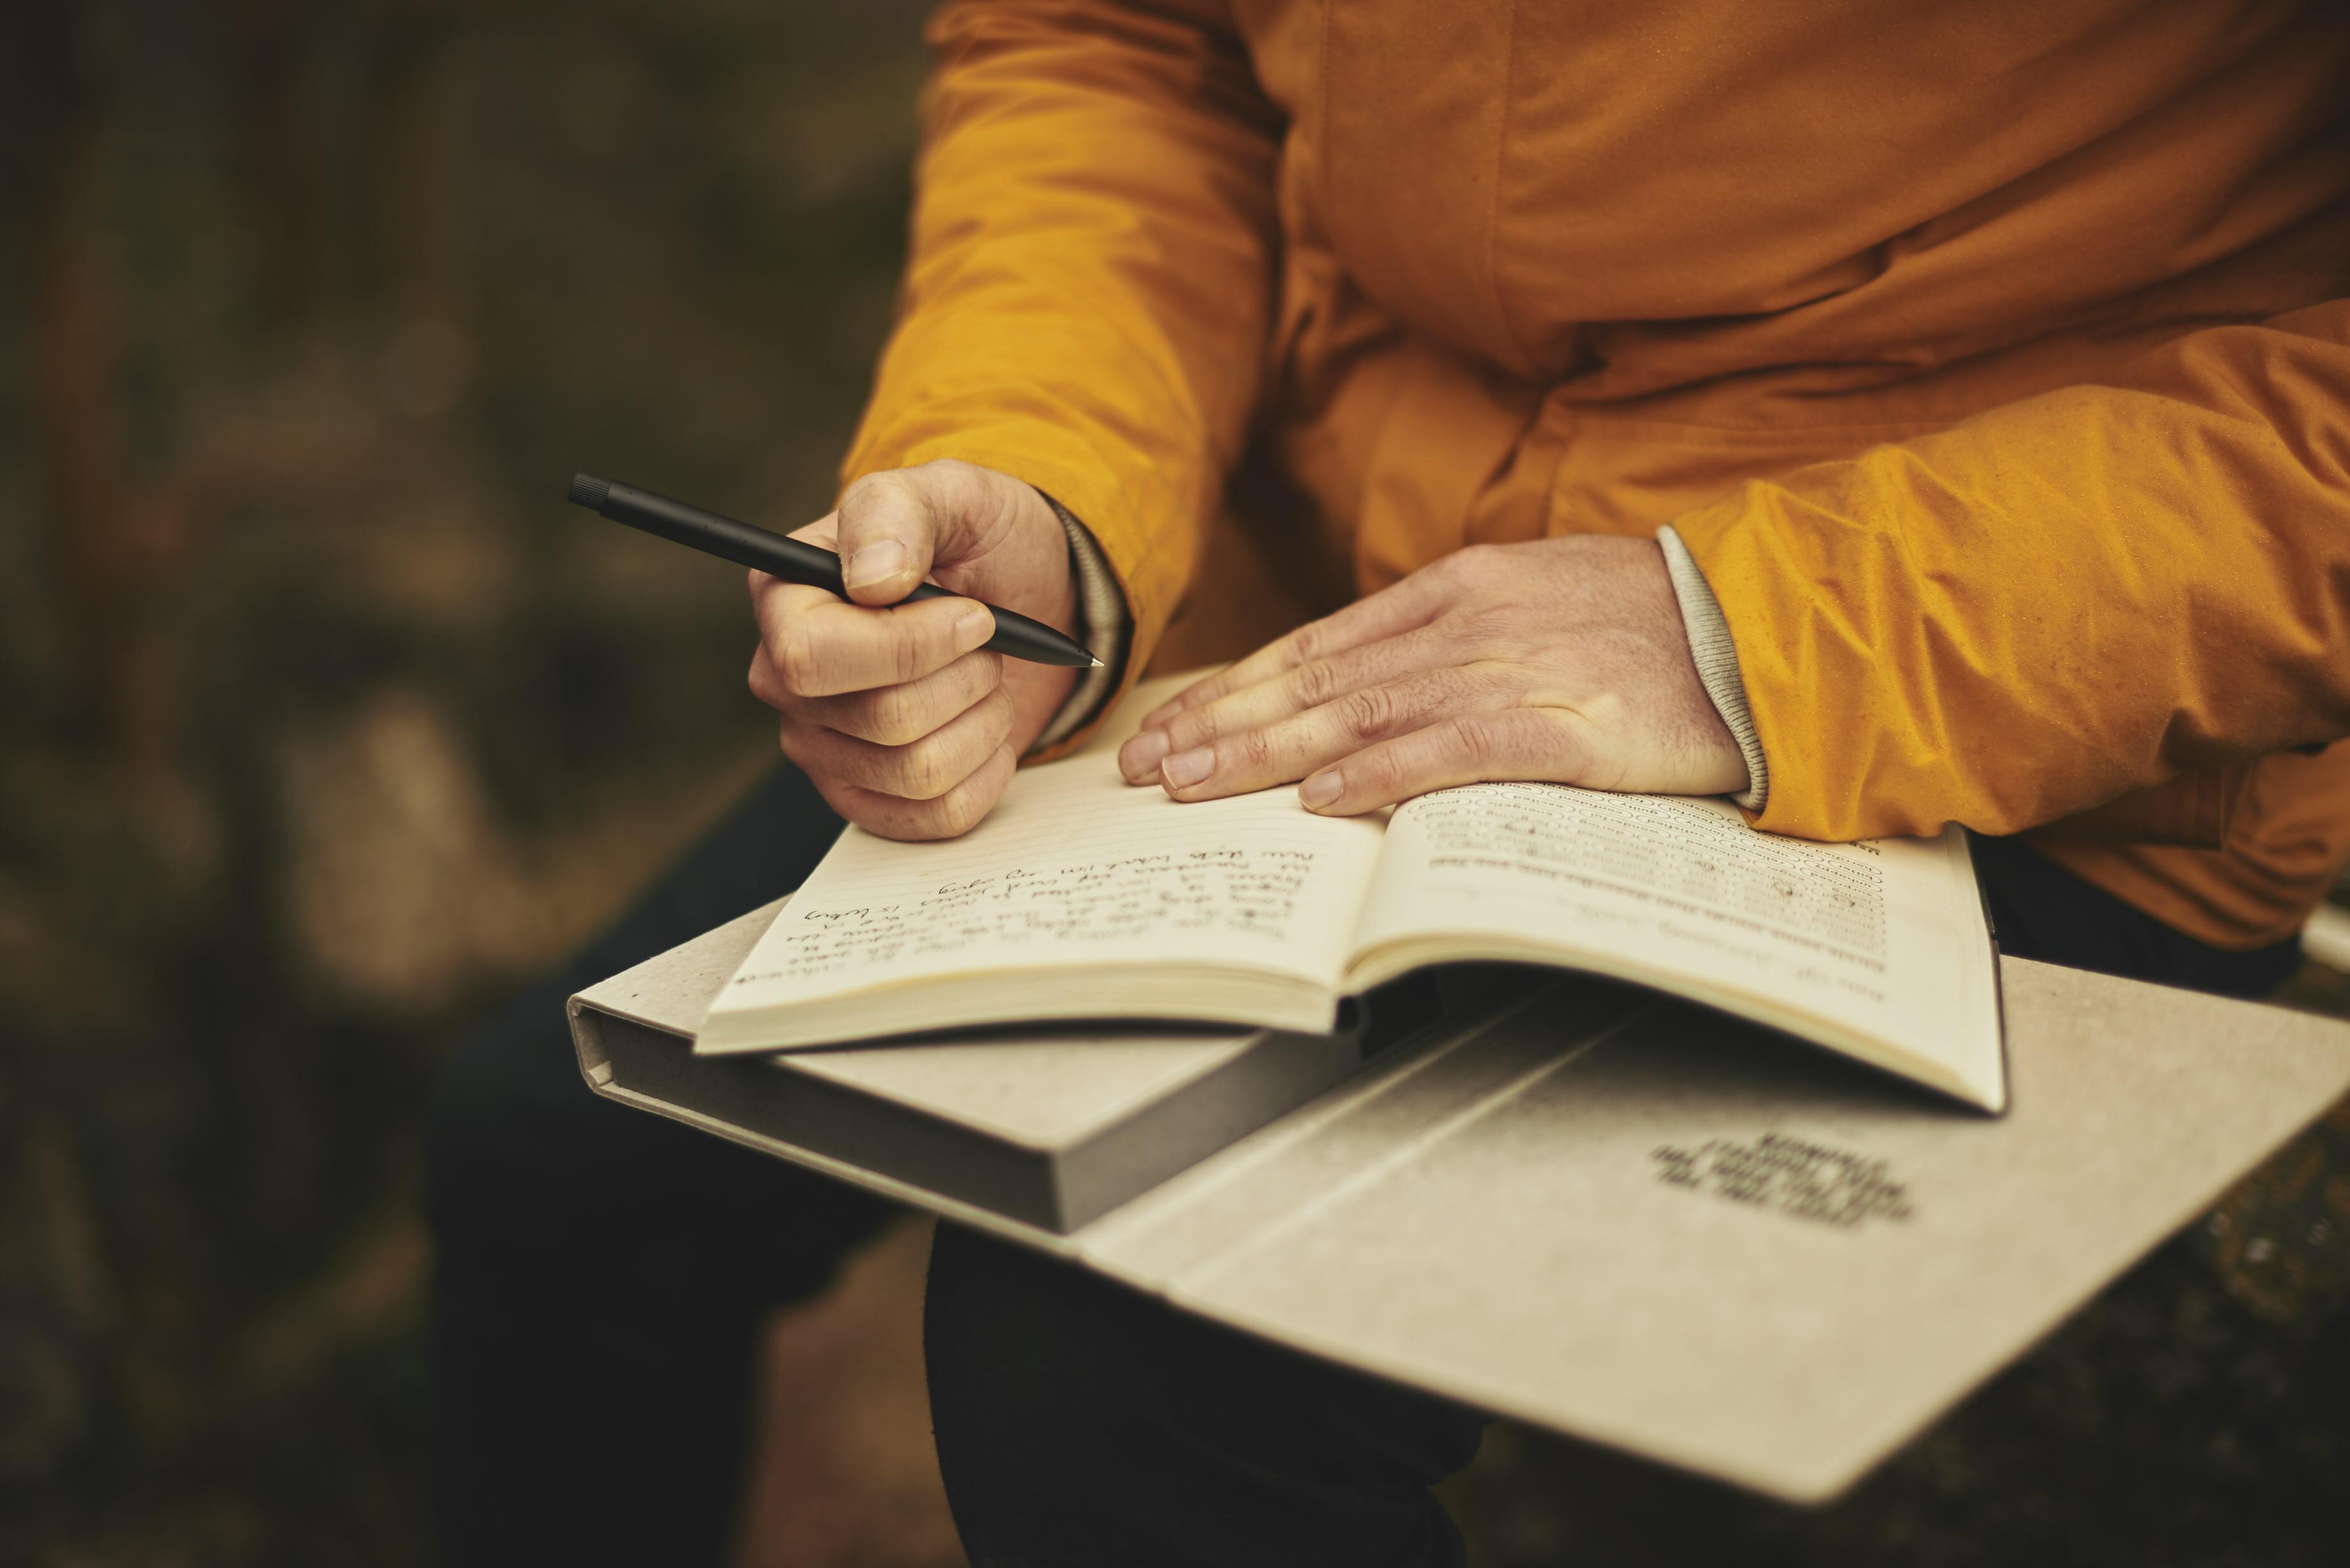 notebook-writing-man-book-person-blur-921665-pxhere.com